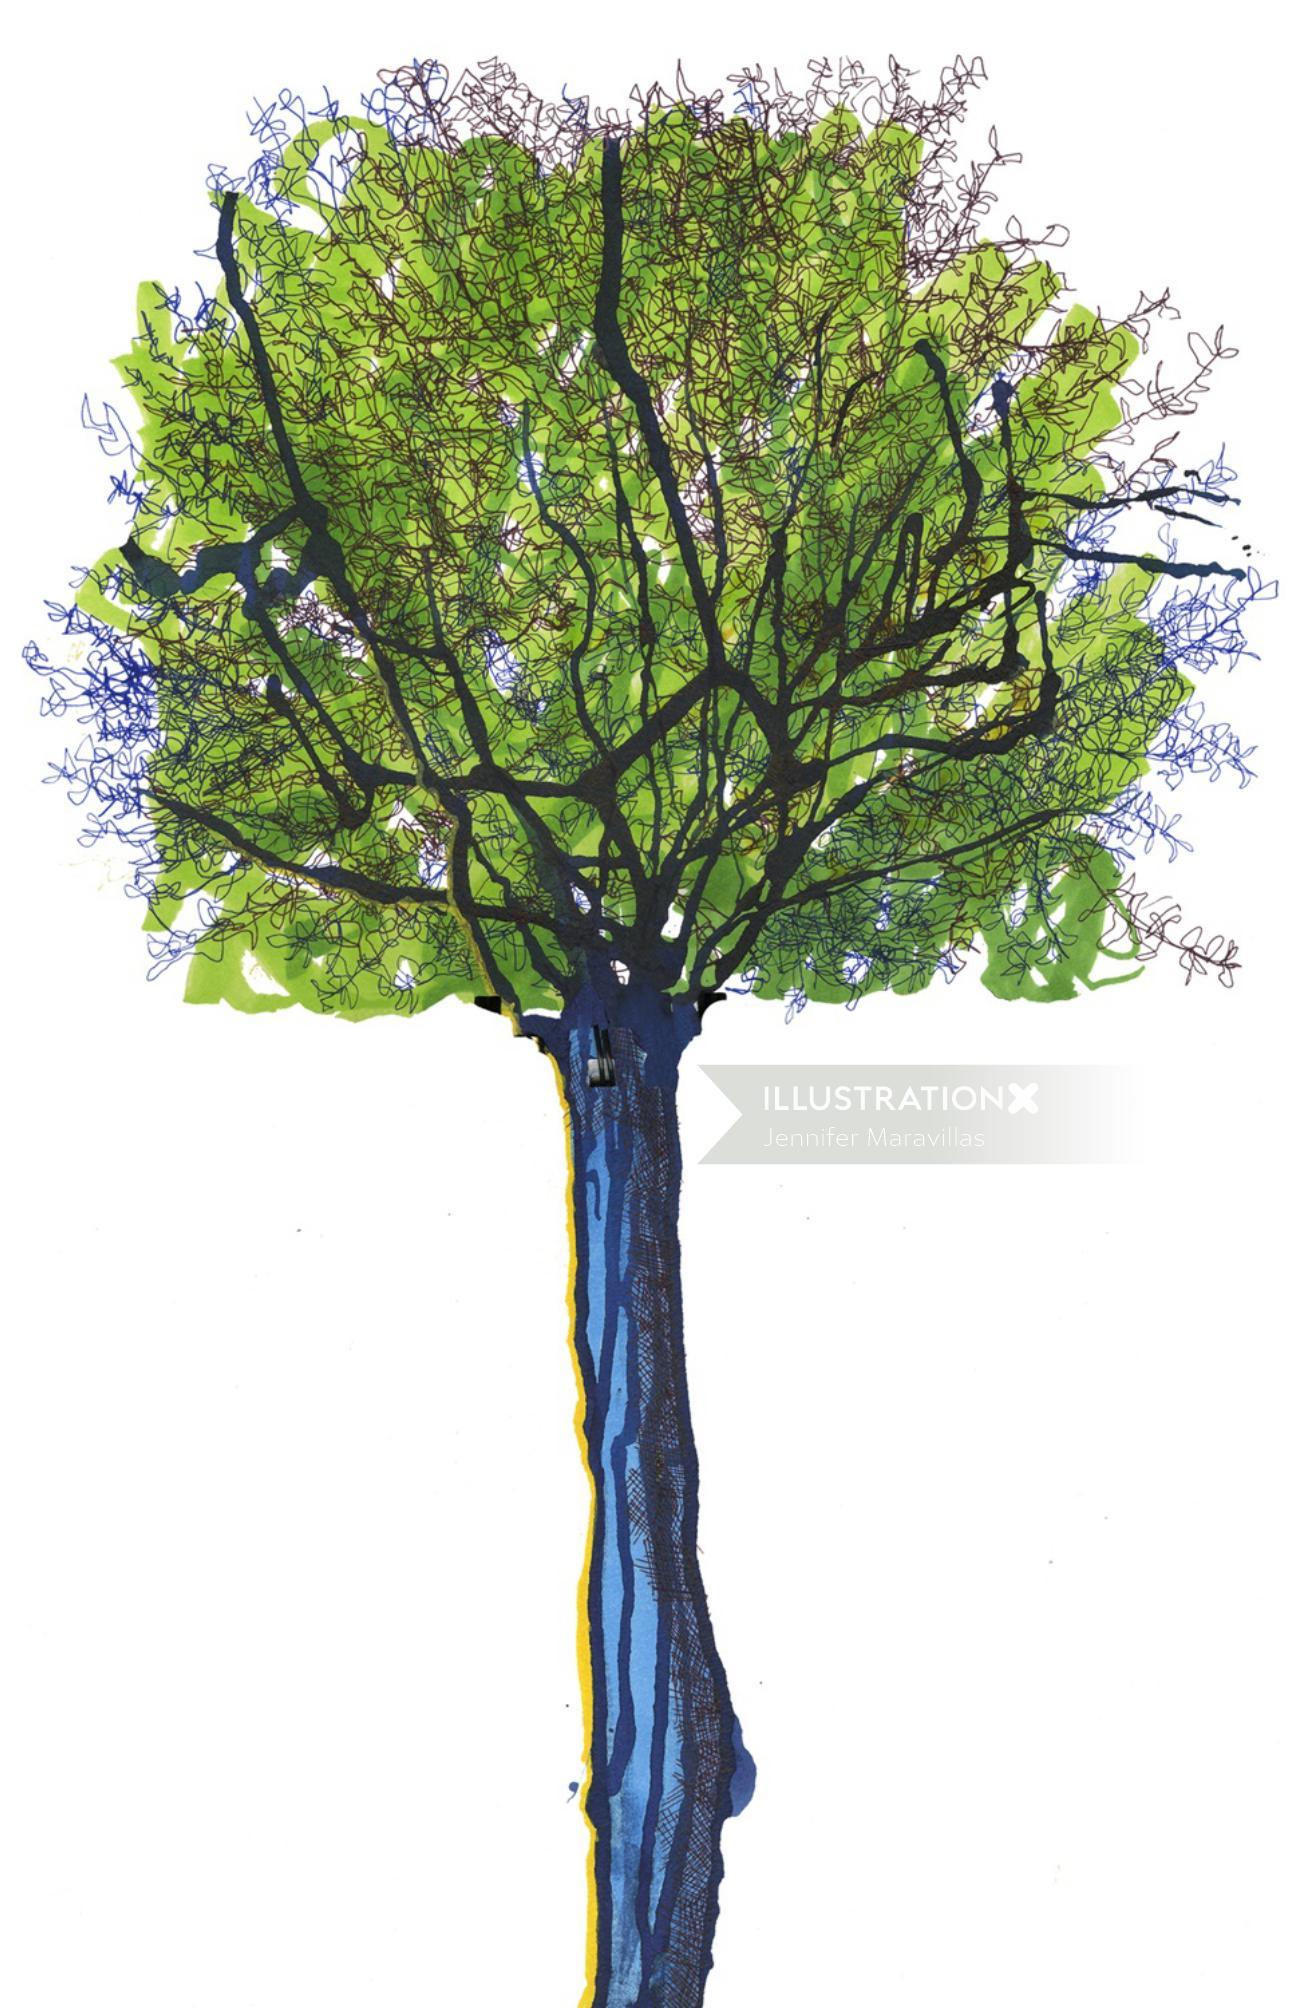 Tree | Nature illustration collection